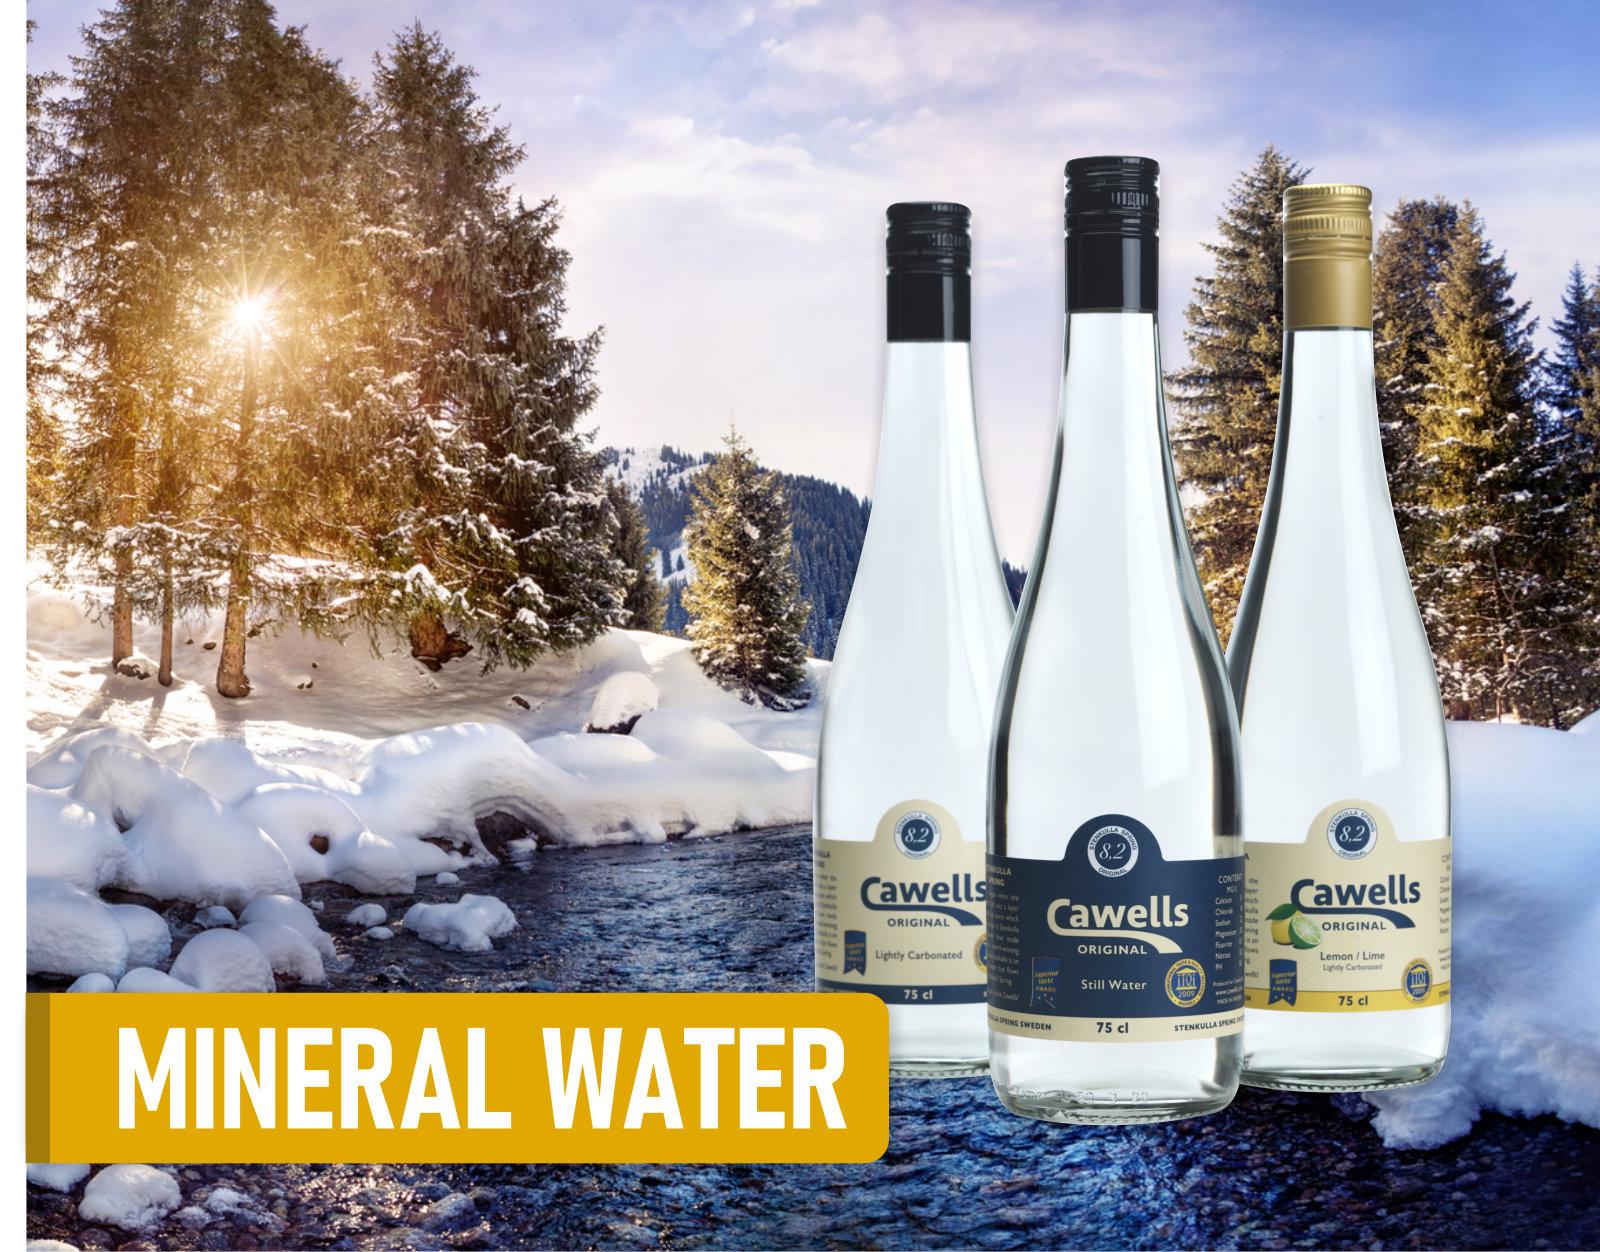 Cawells Mineral Water